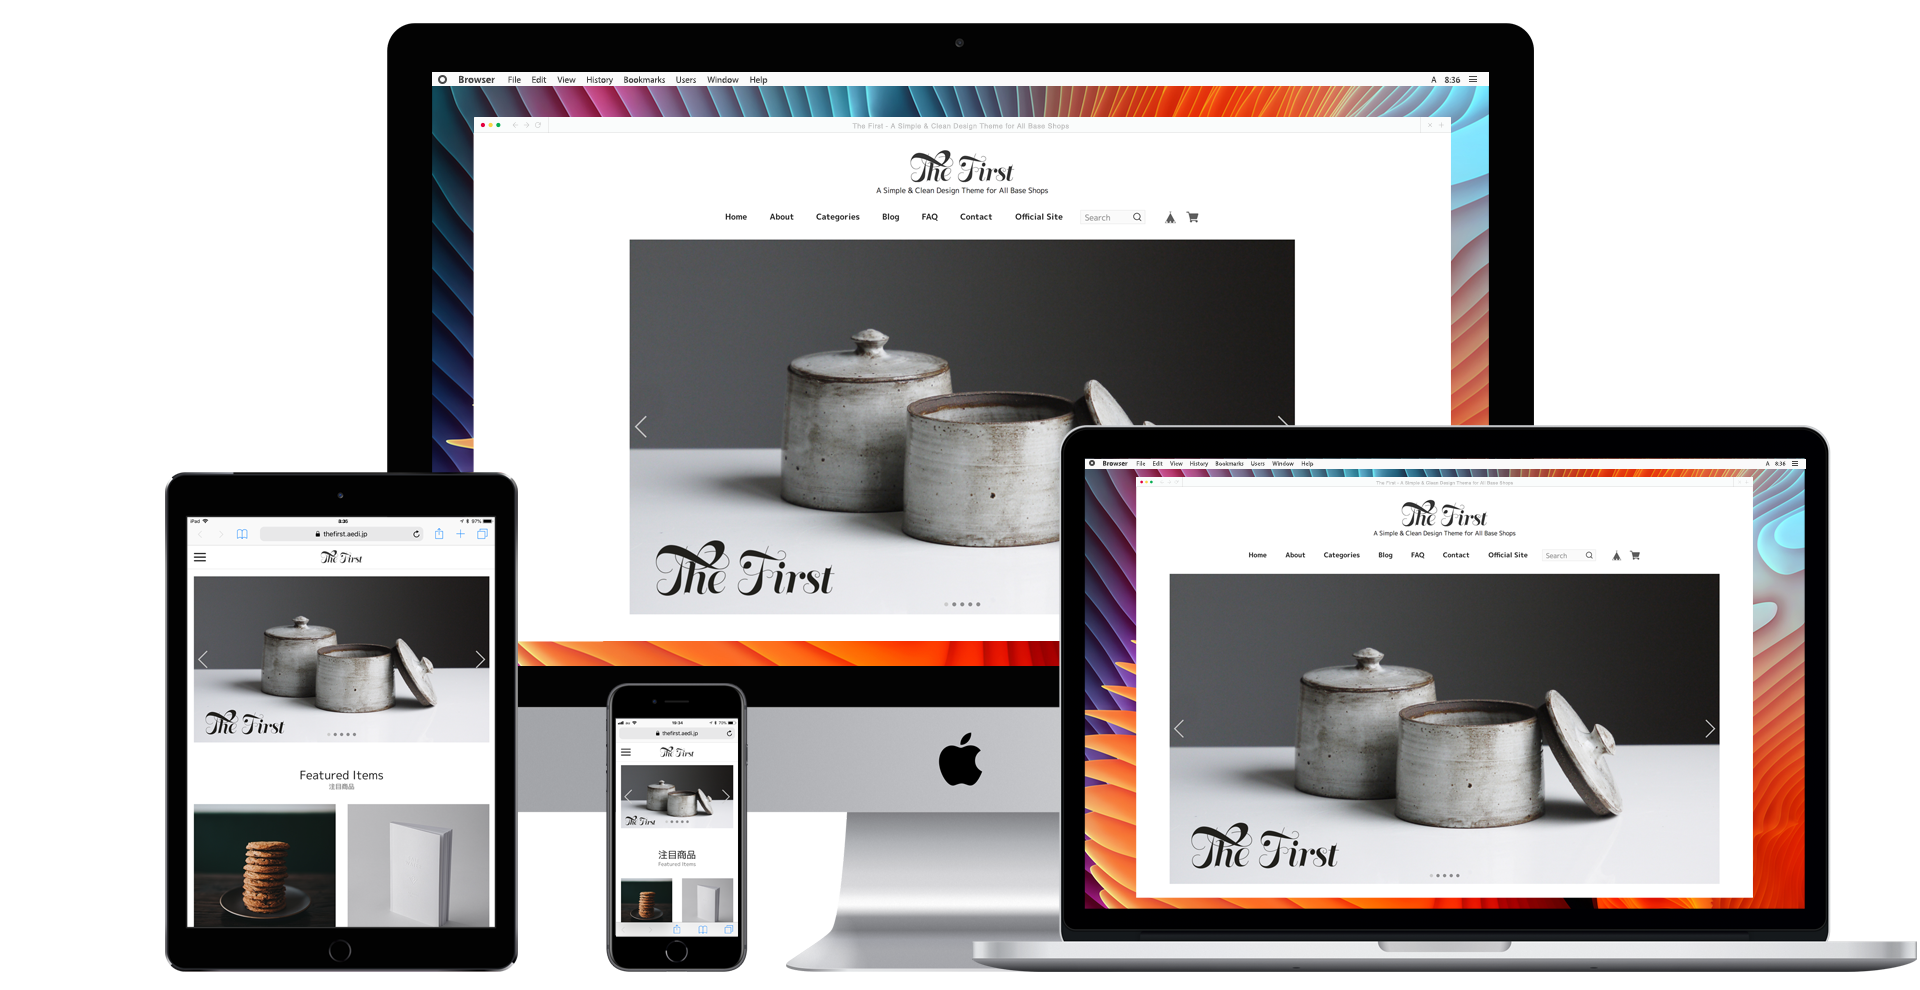 ECサイト制作・ショッピングサイト制作・オンラインショップ構築・ホームページ制作 ECサイトテーマ The First